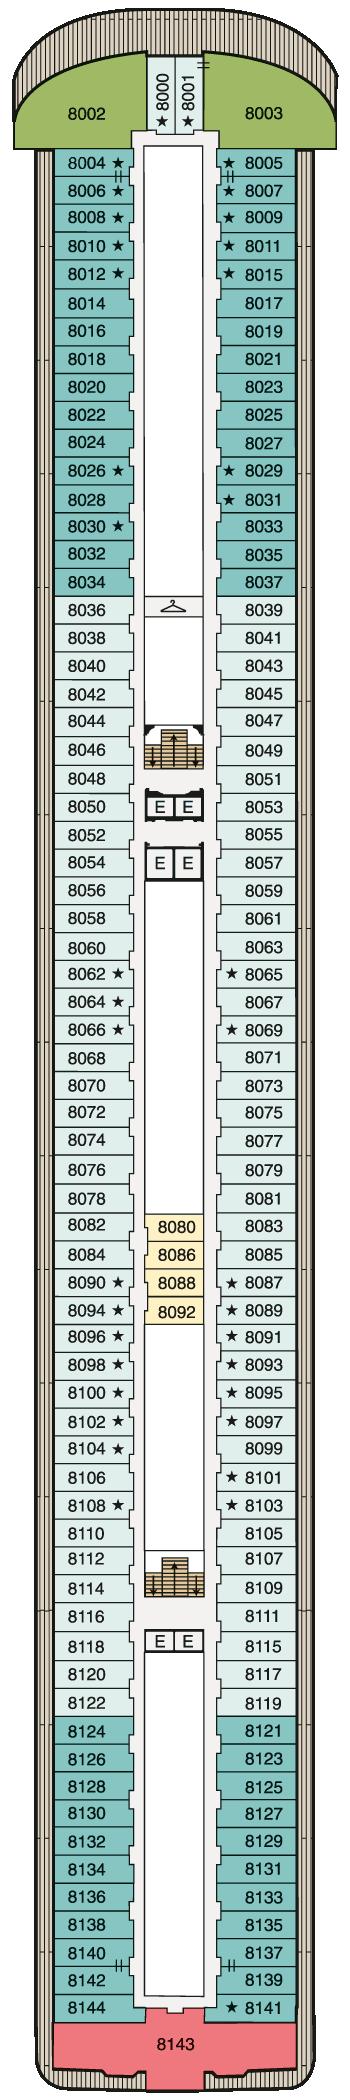 MS Marina - Deck 8